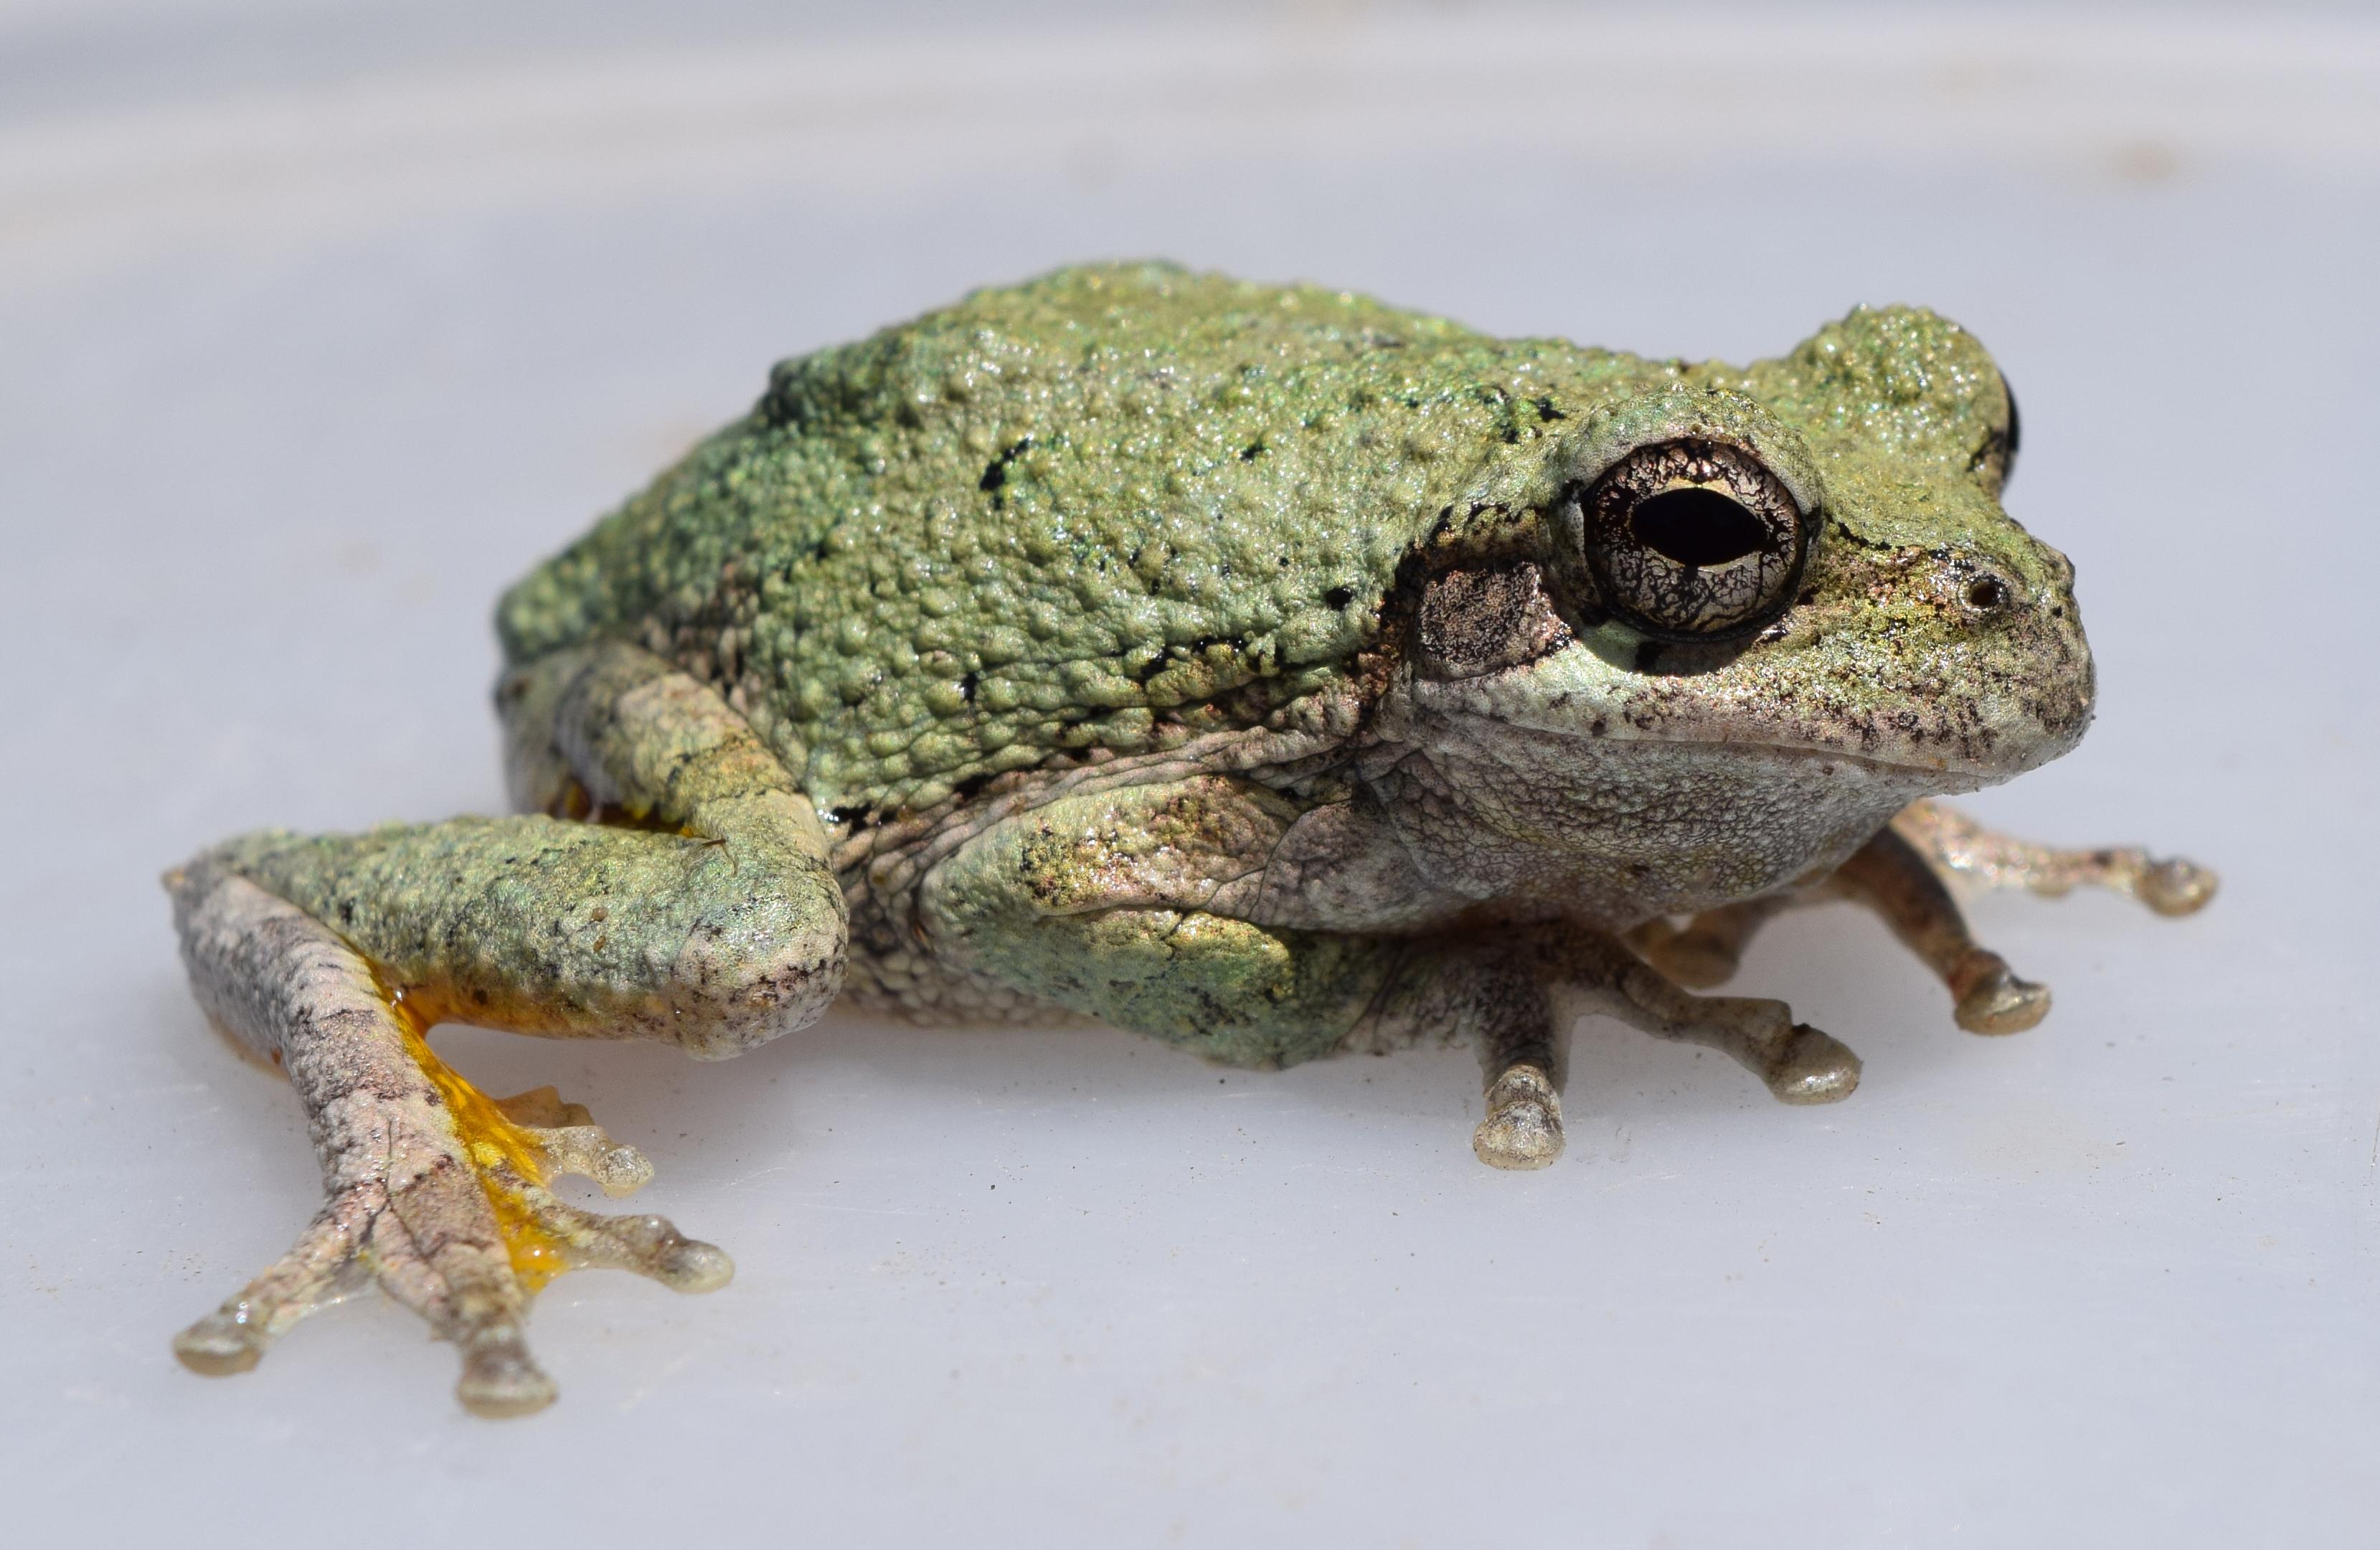 Cope's Gray Tree Frog (Dryophytes chrysoscelis)